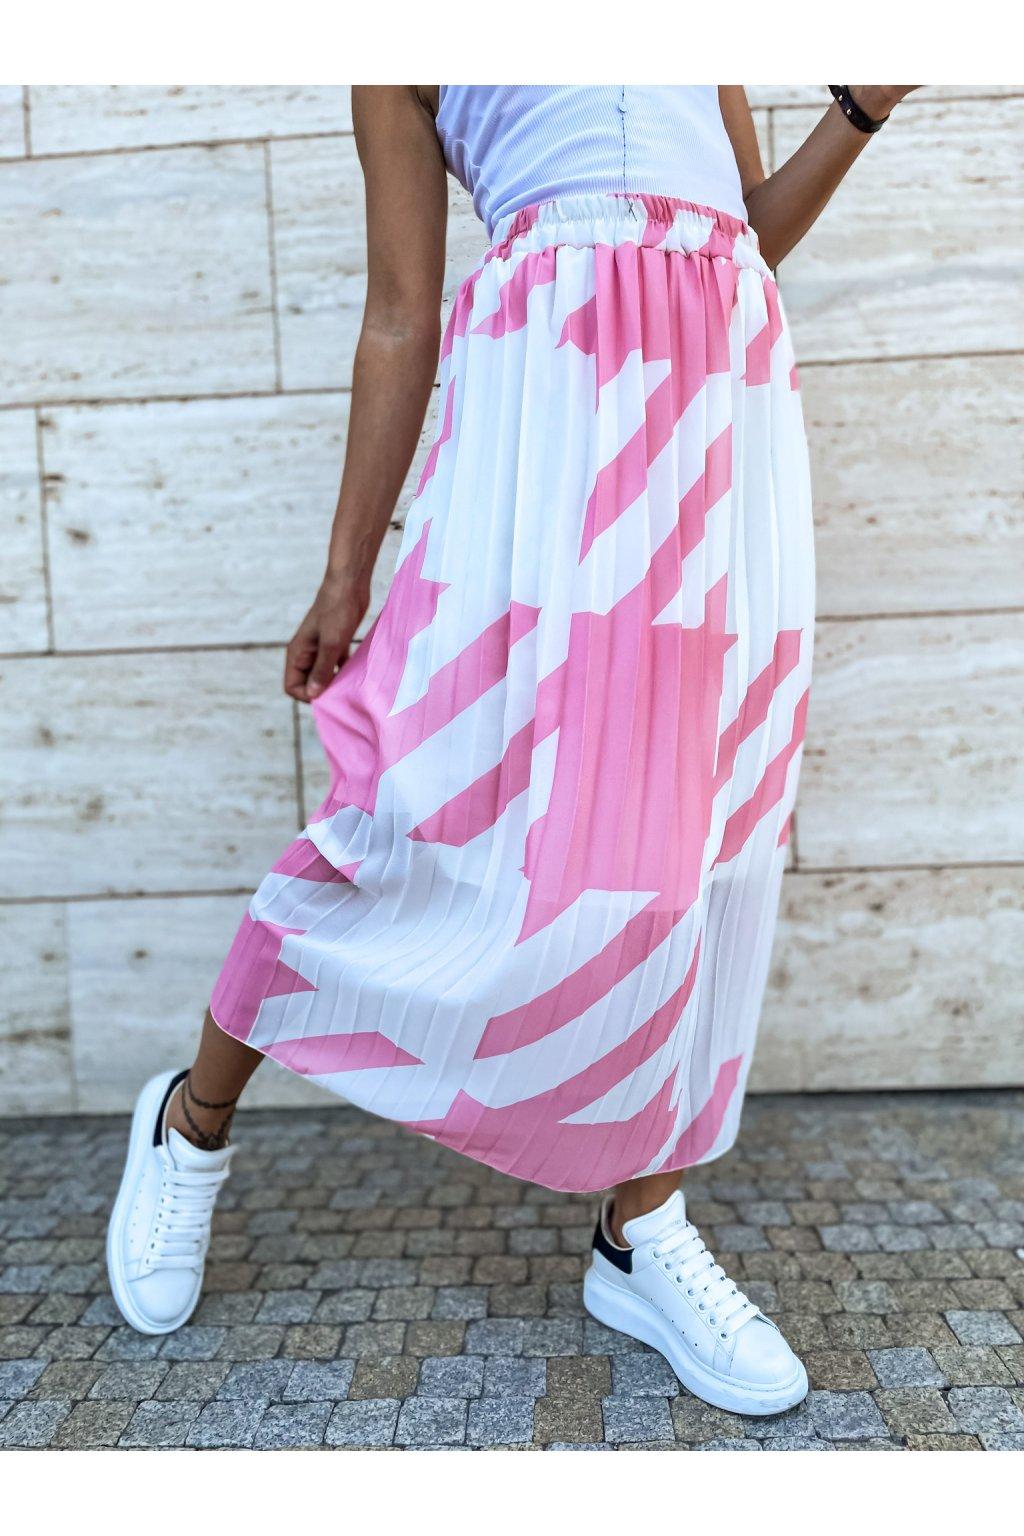 damska sukne lior powder pink eshopat cz 1